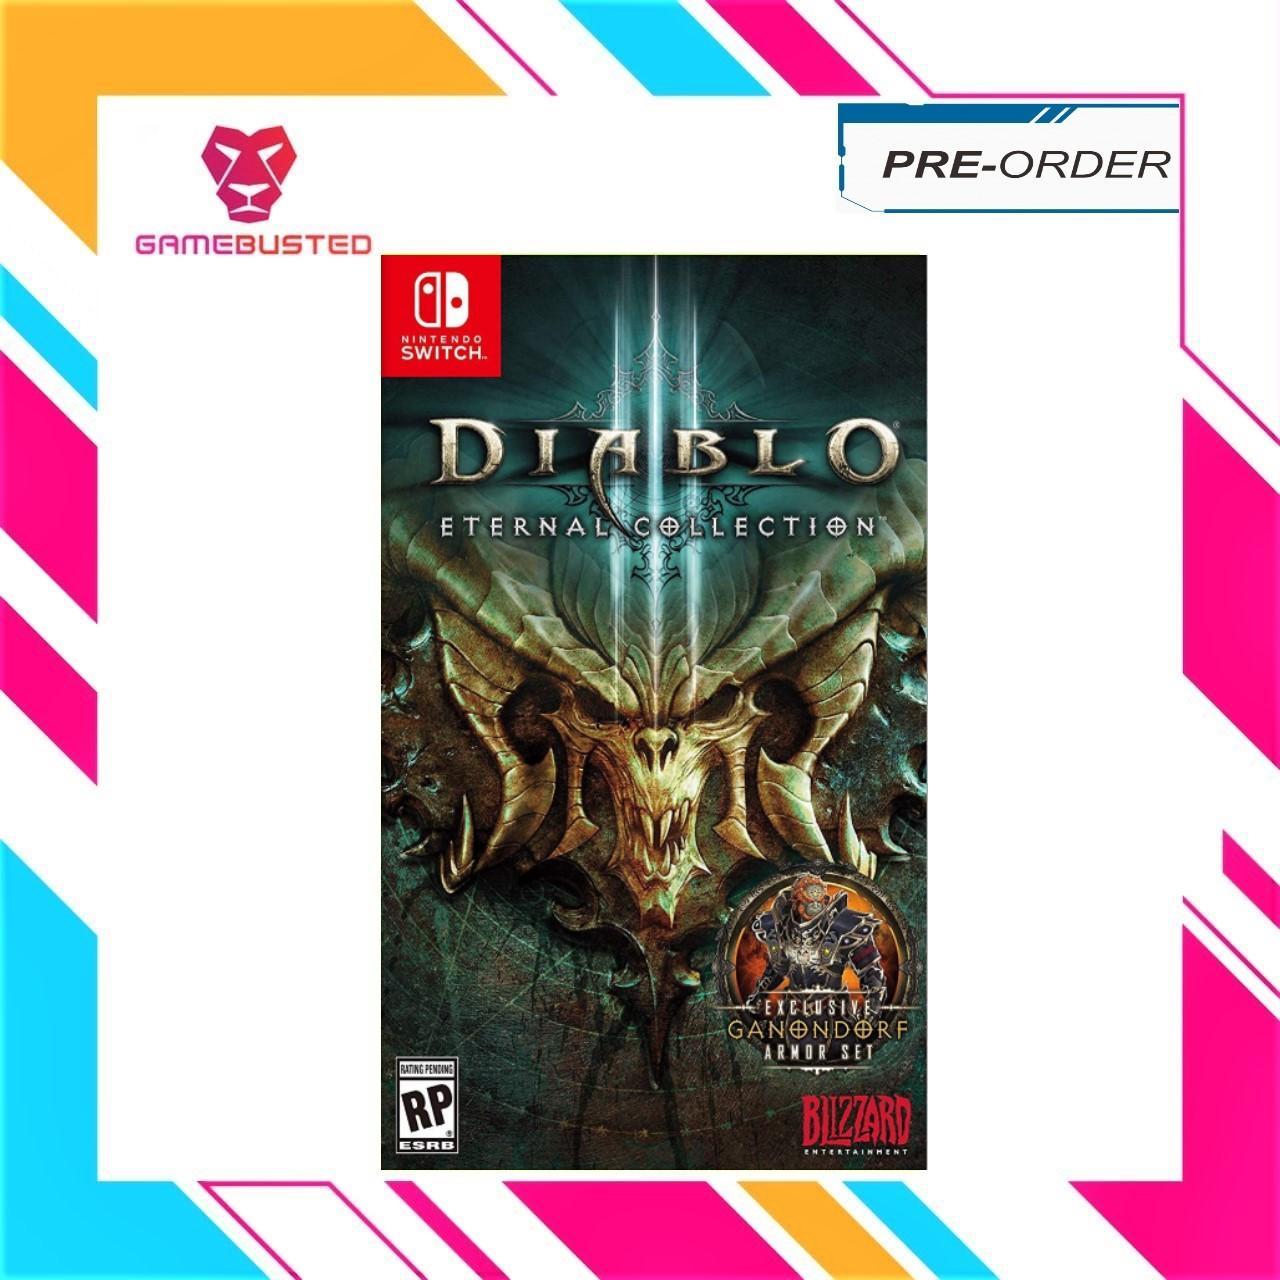 [Pre-Order] Nintendo Switch Diablo III Eternal Collection (Earliest Shipping 2nd November 2018)